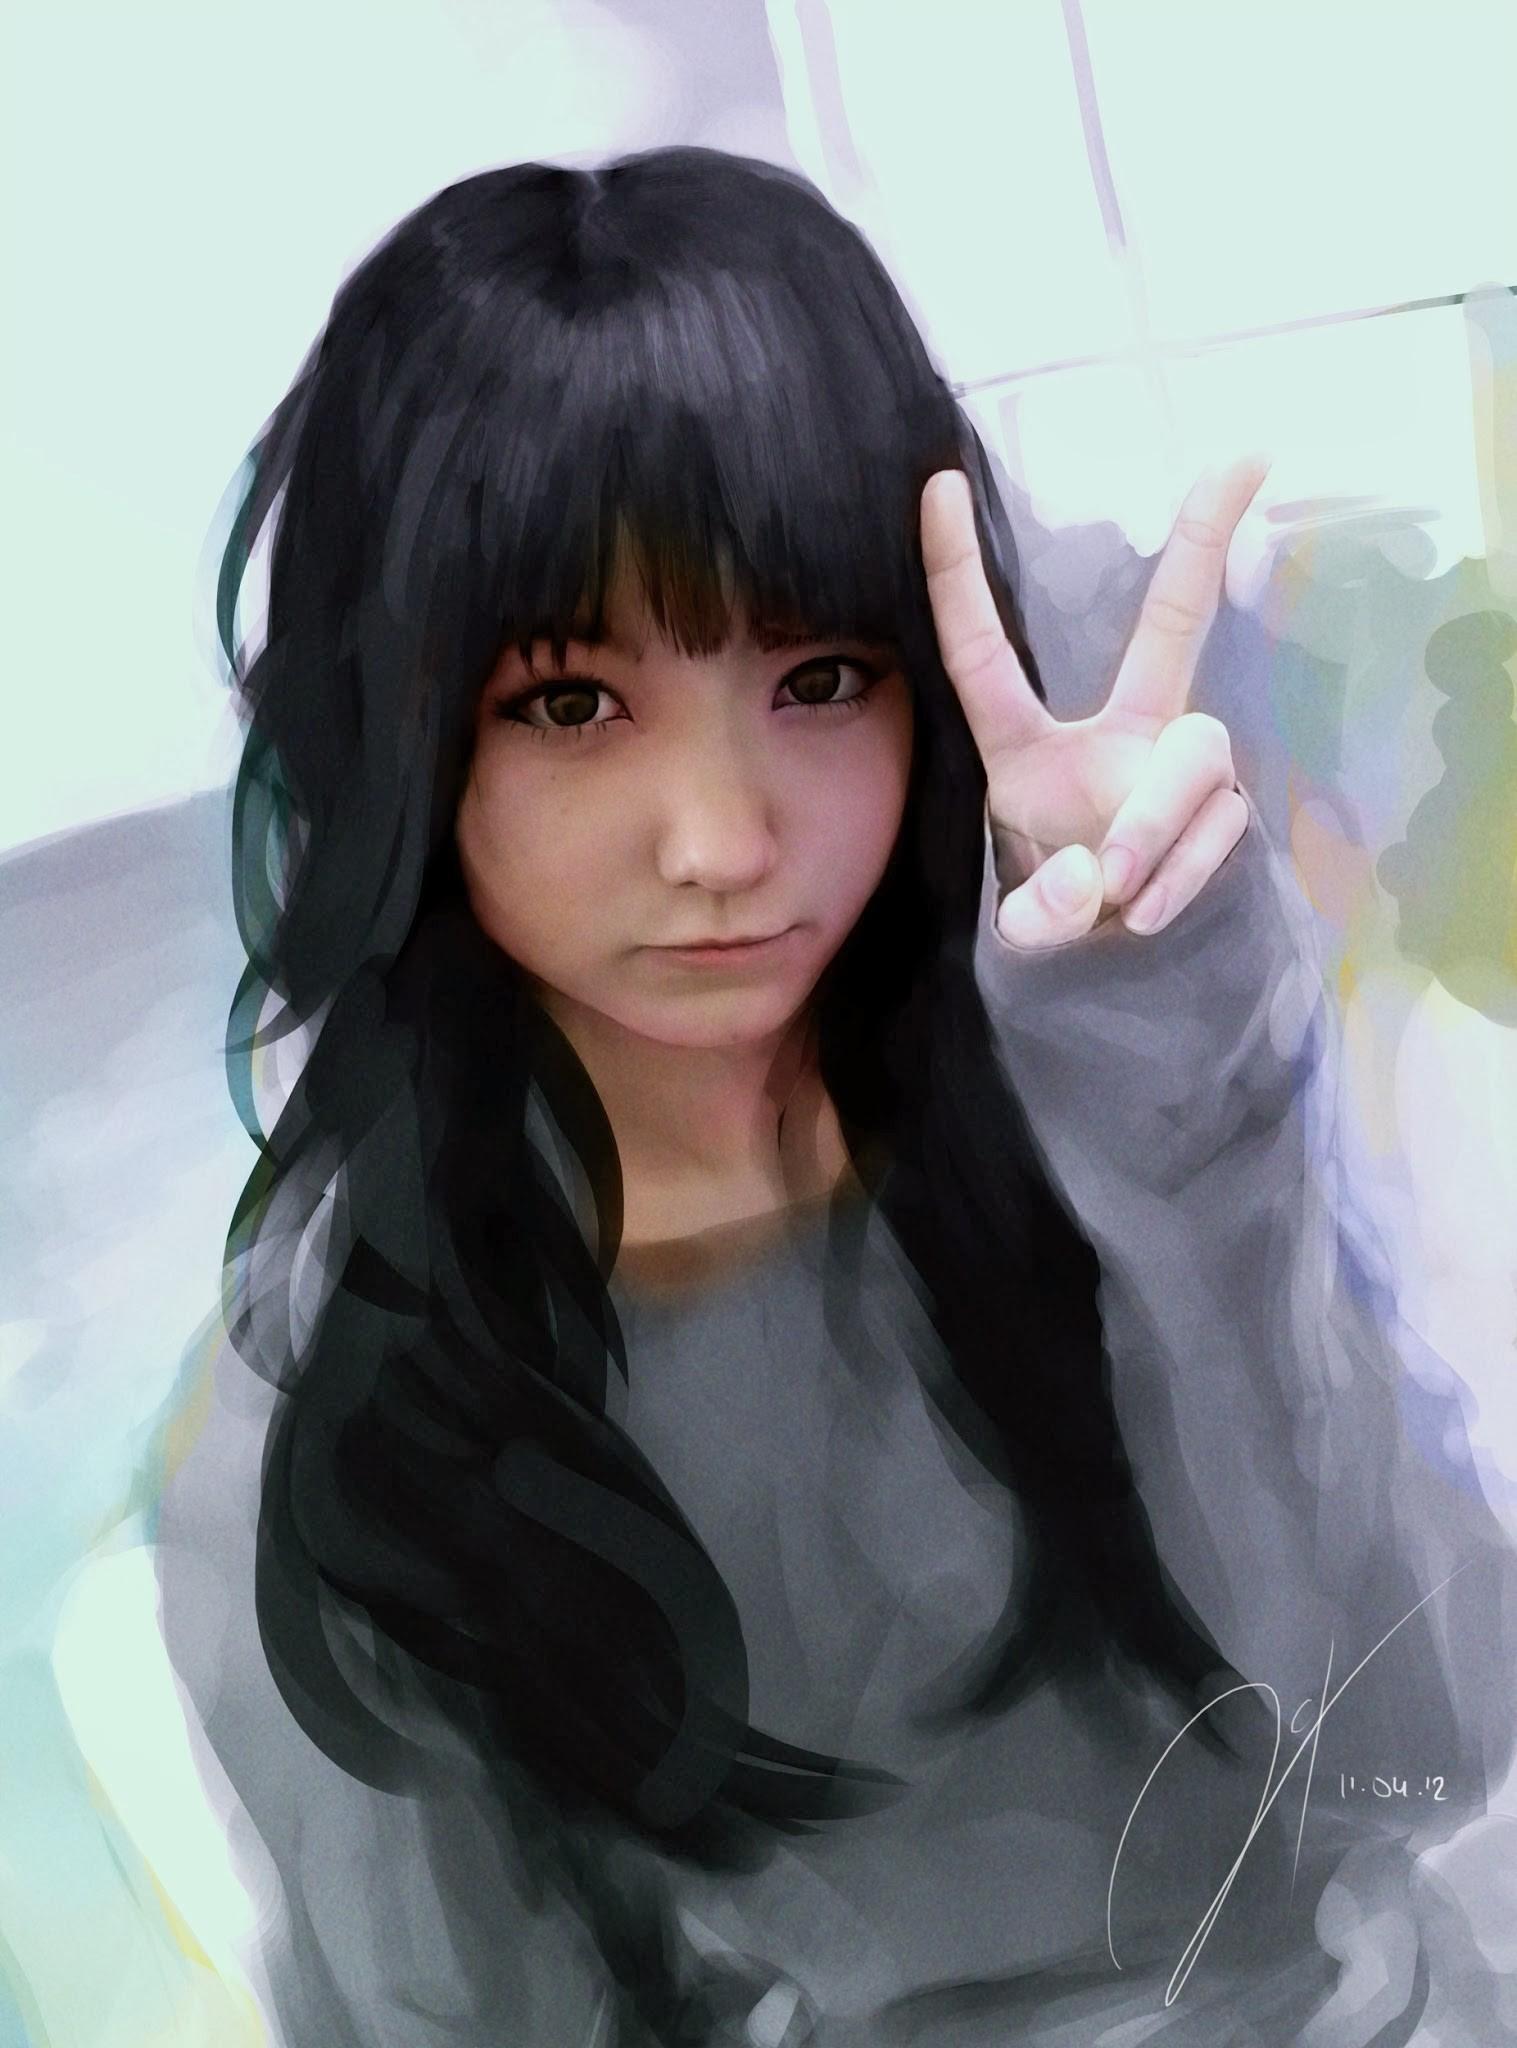 Wallpaper : women, cosplay, model, long hair, anime, Asian